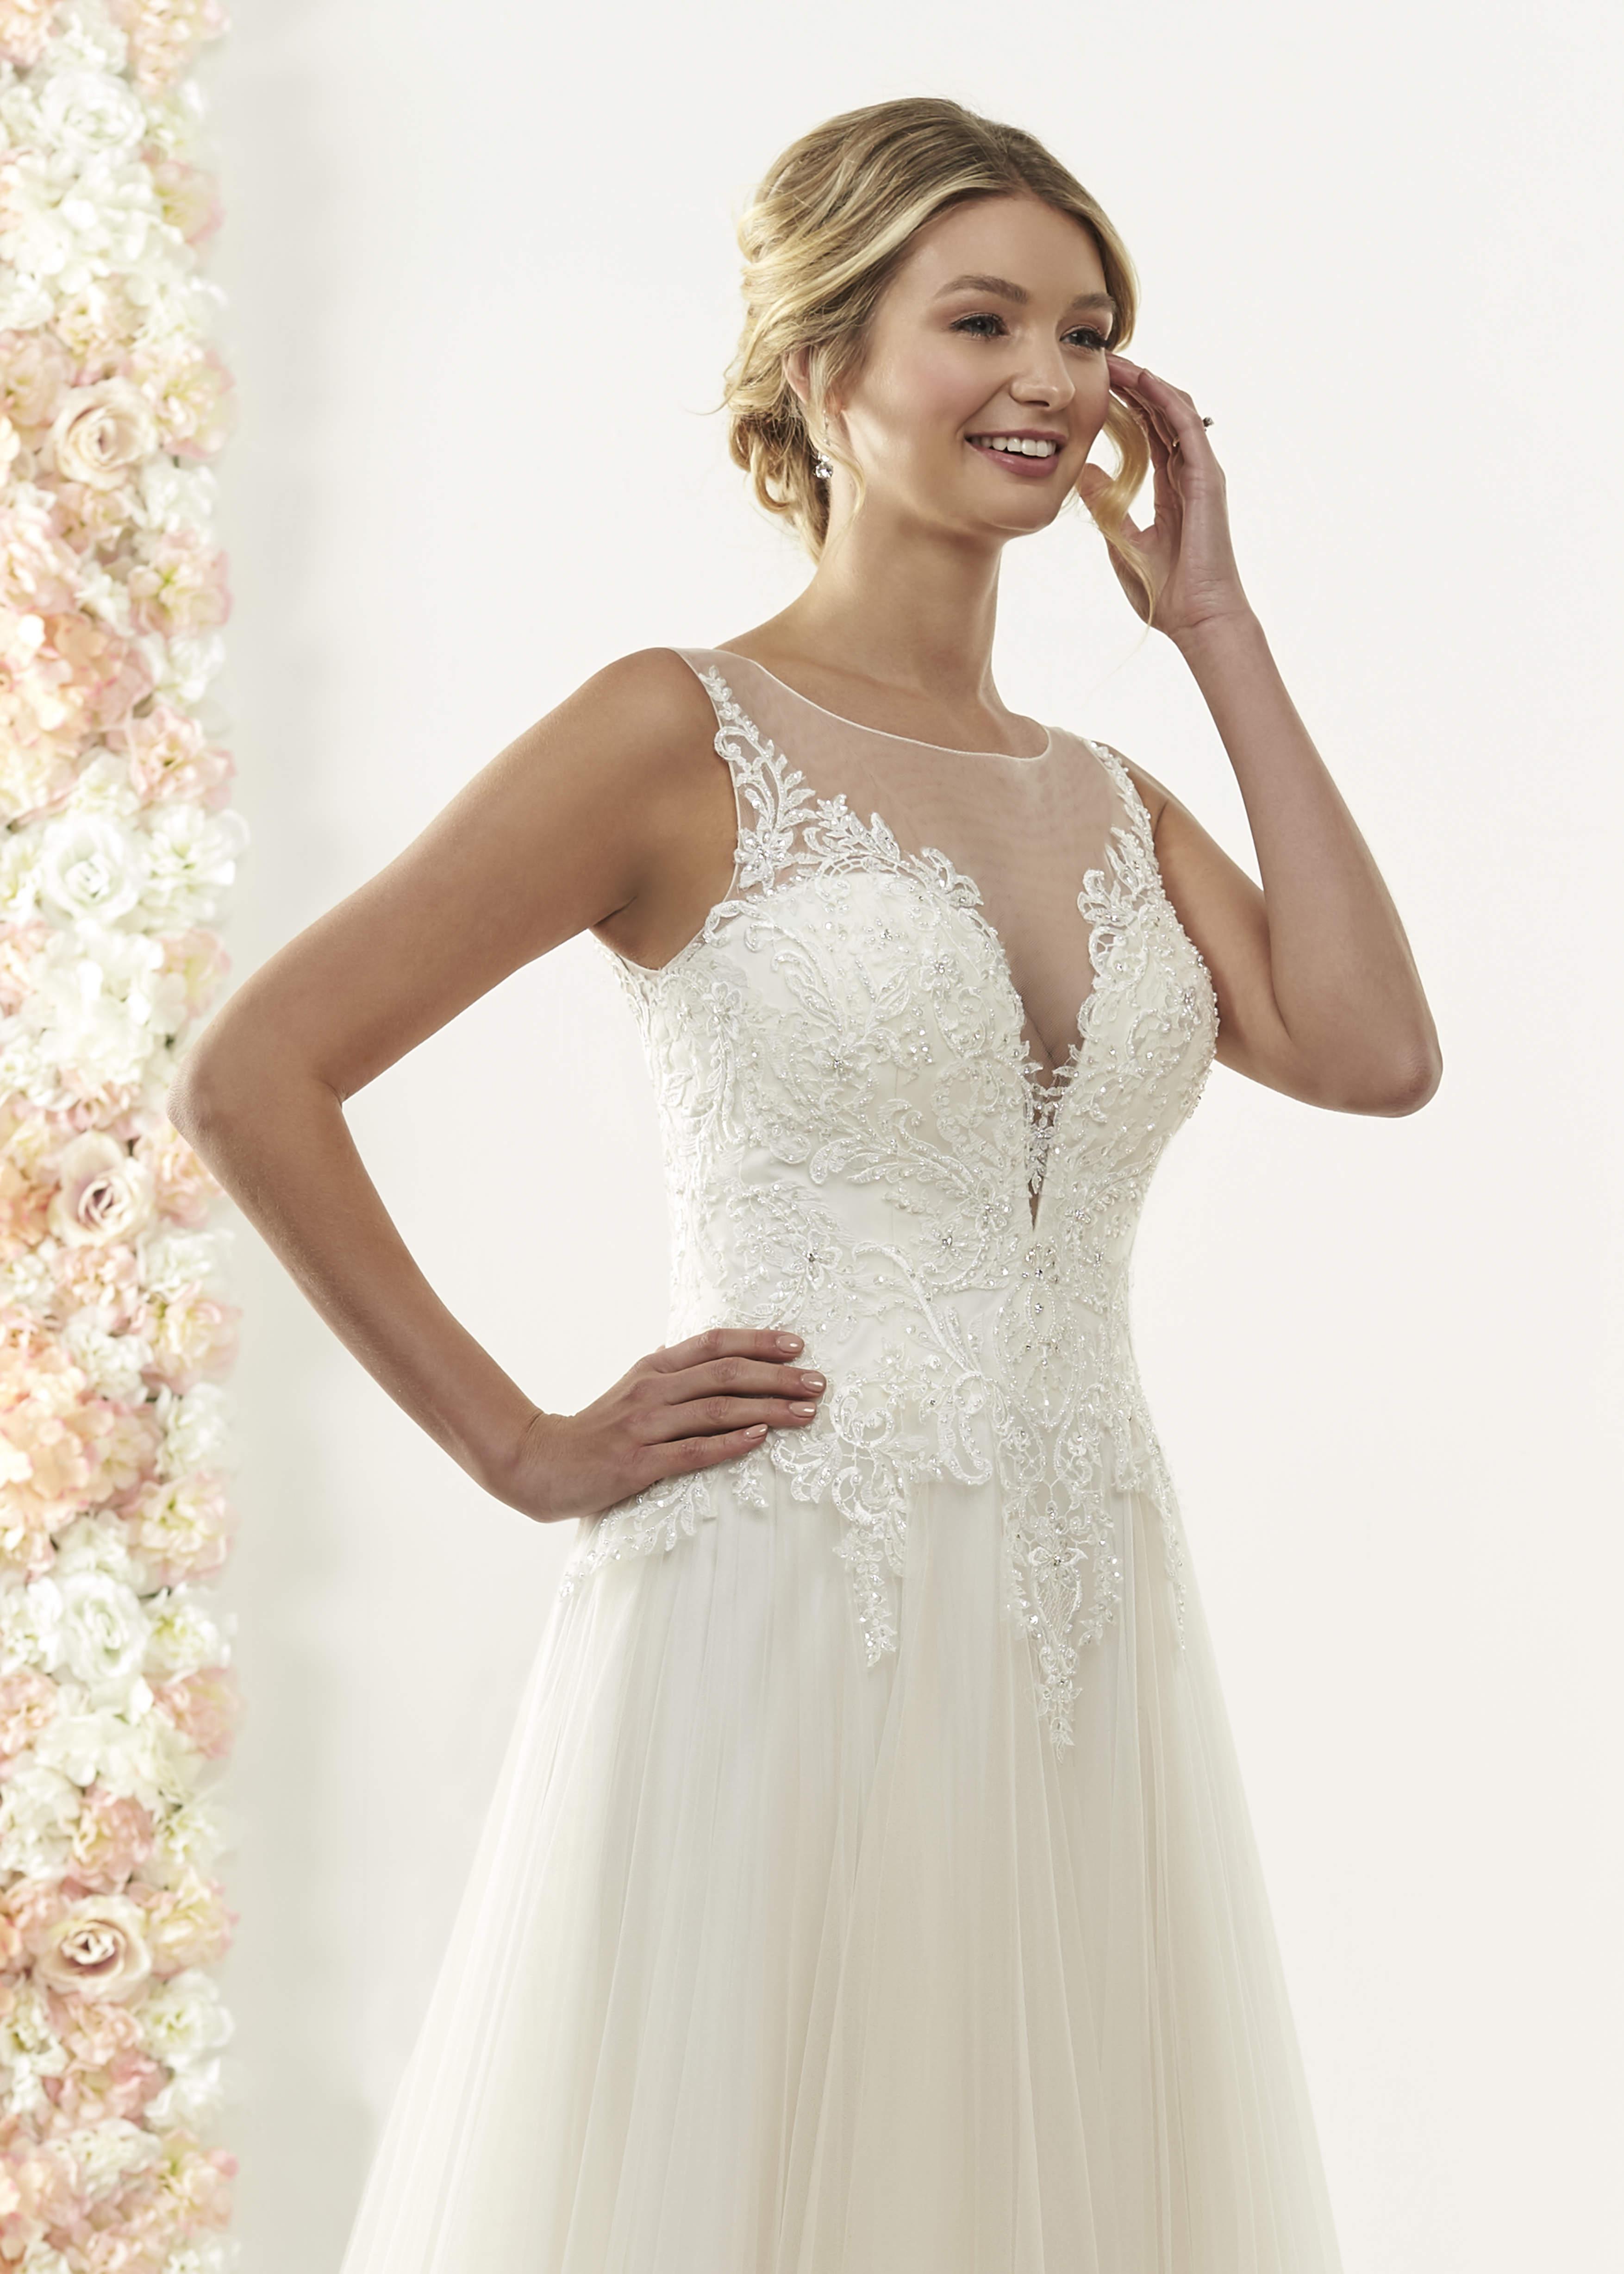 fbe56bdc6 Tiffany Wedding Dresses